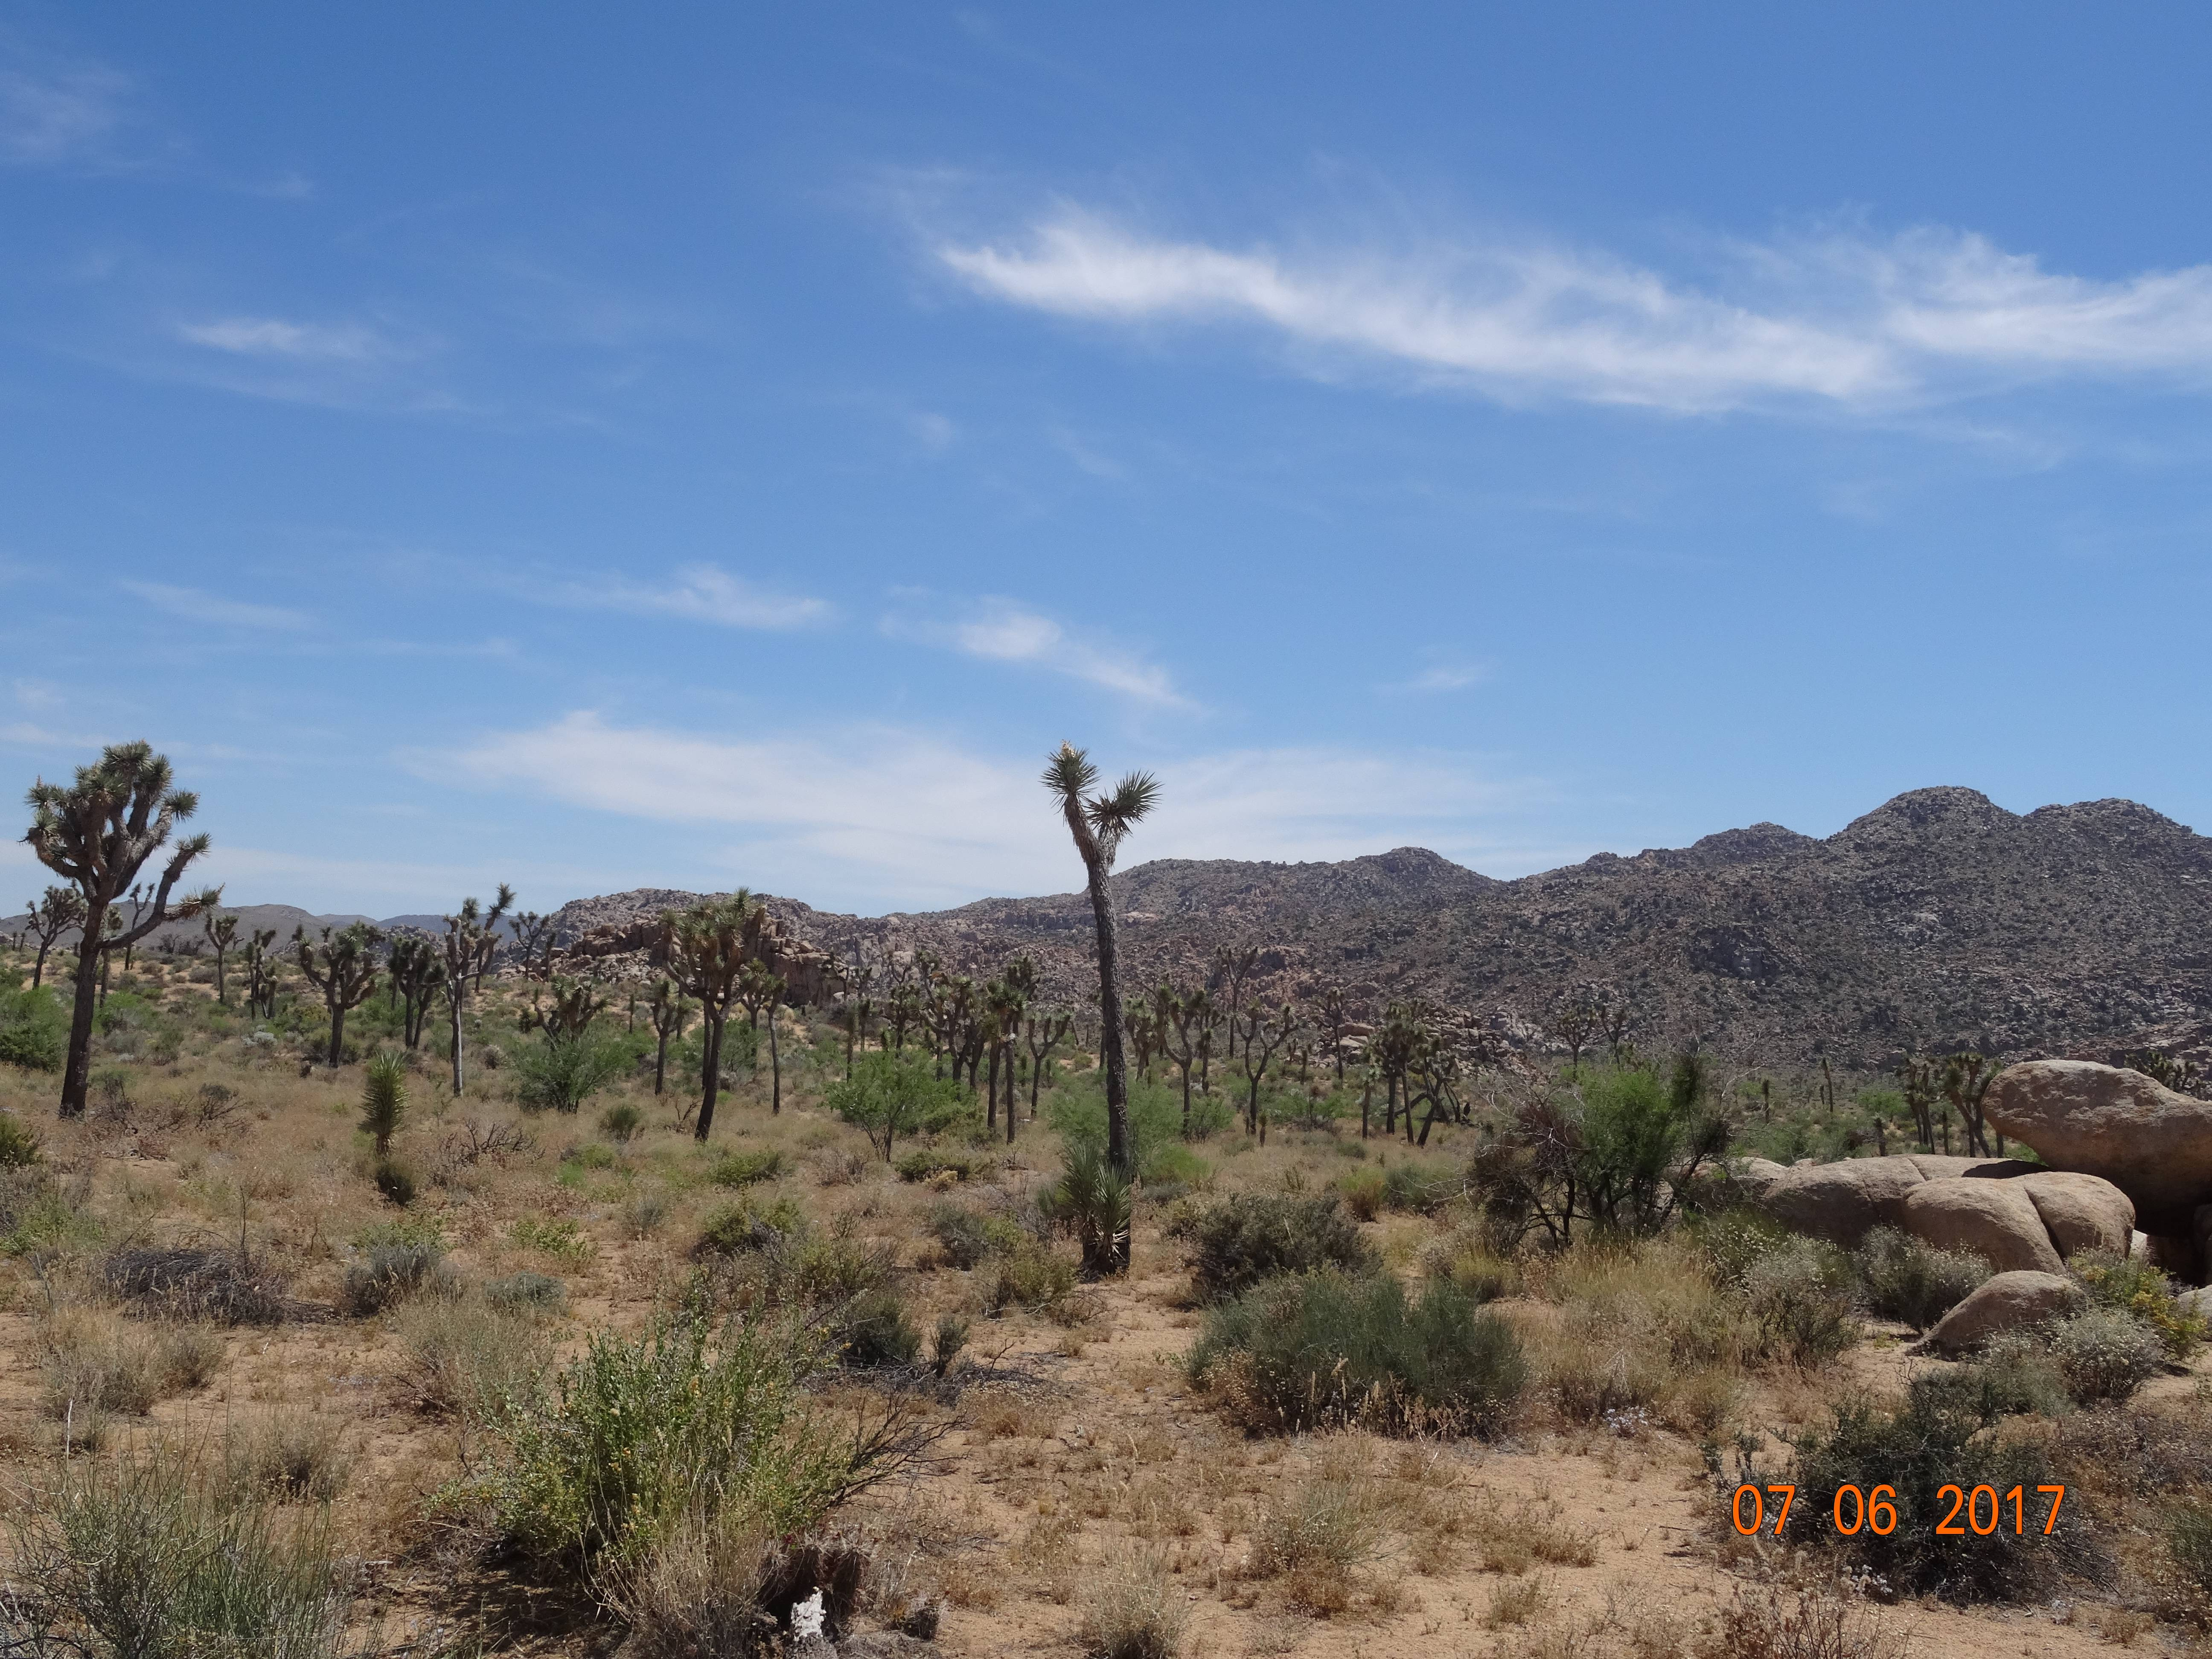 Photo 3: Joshua Tree National Park - USA